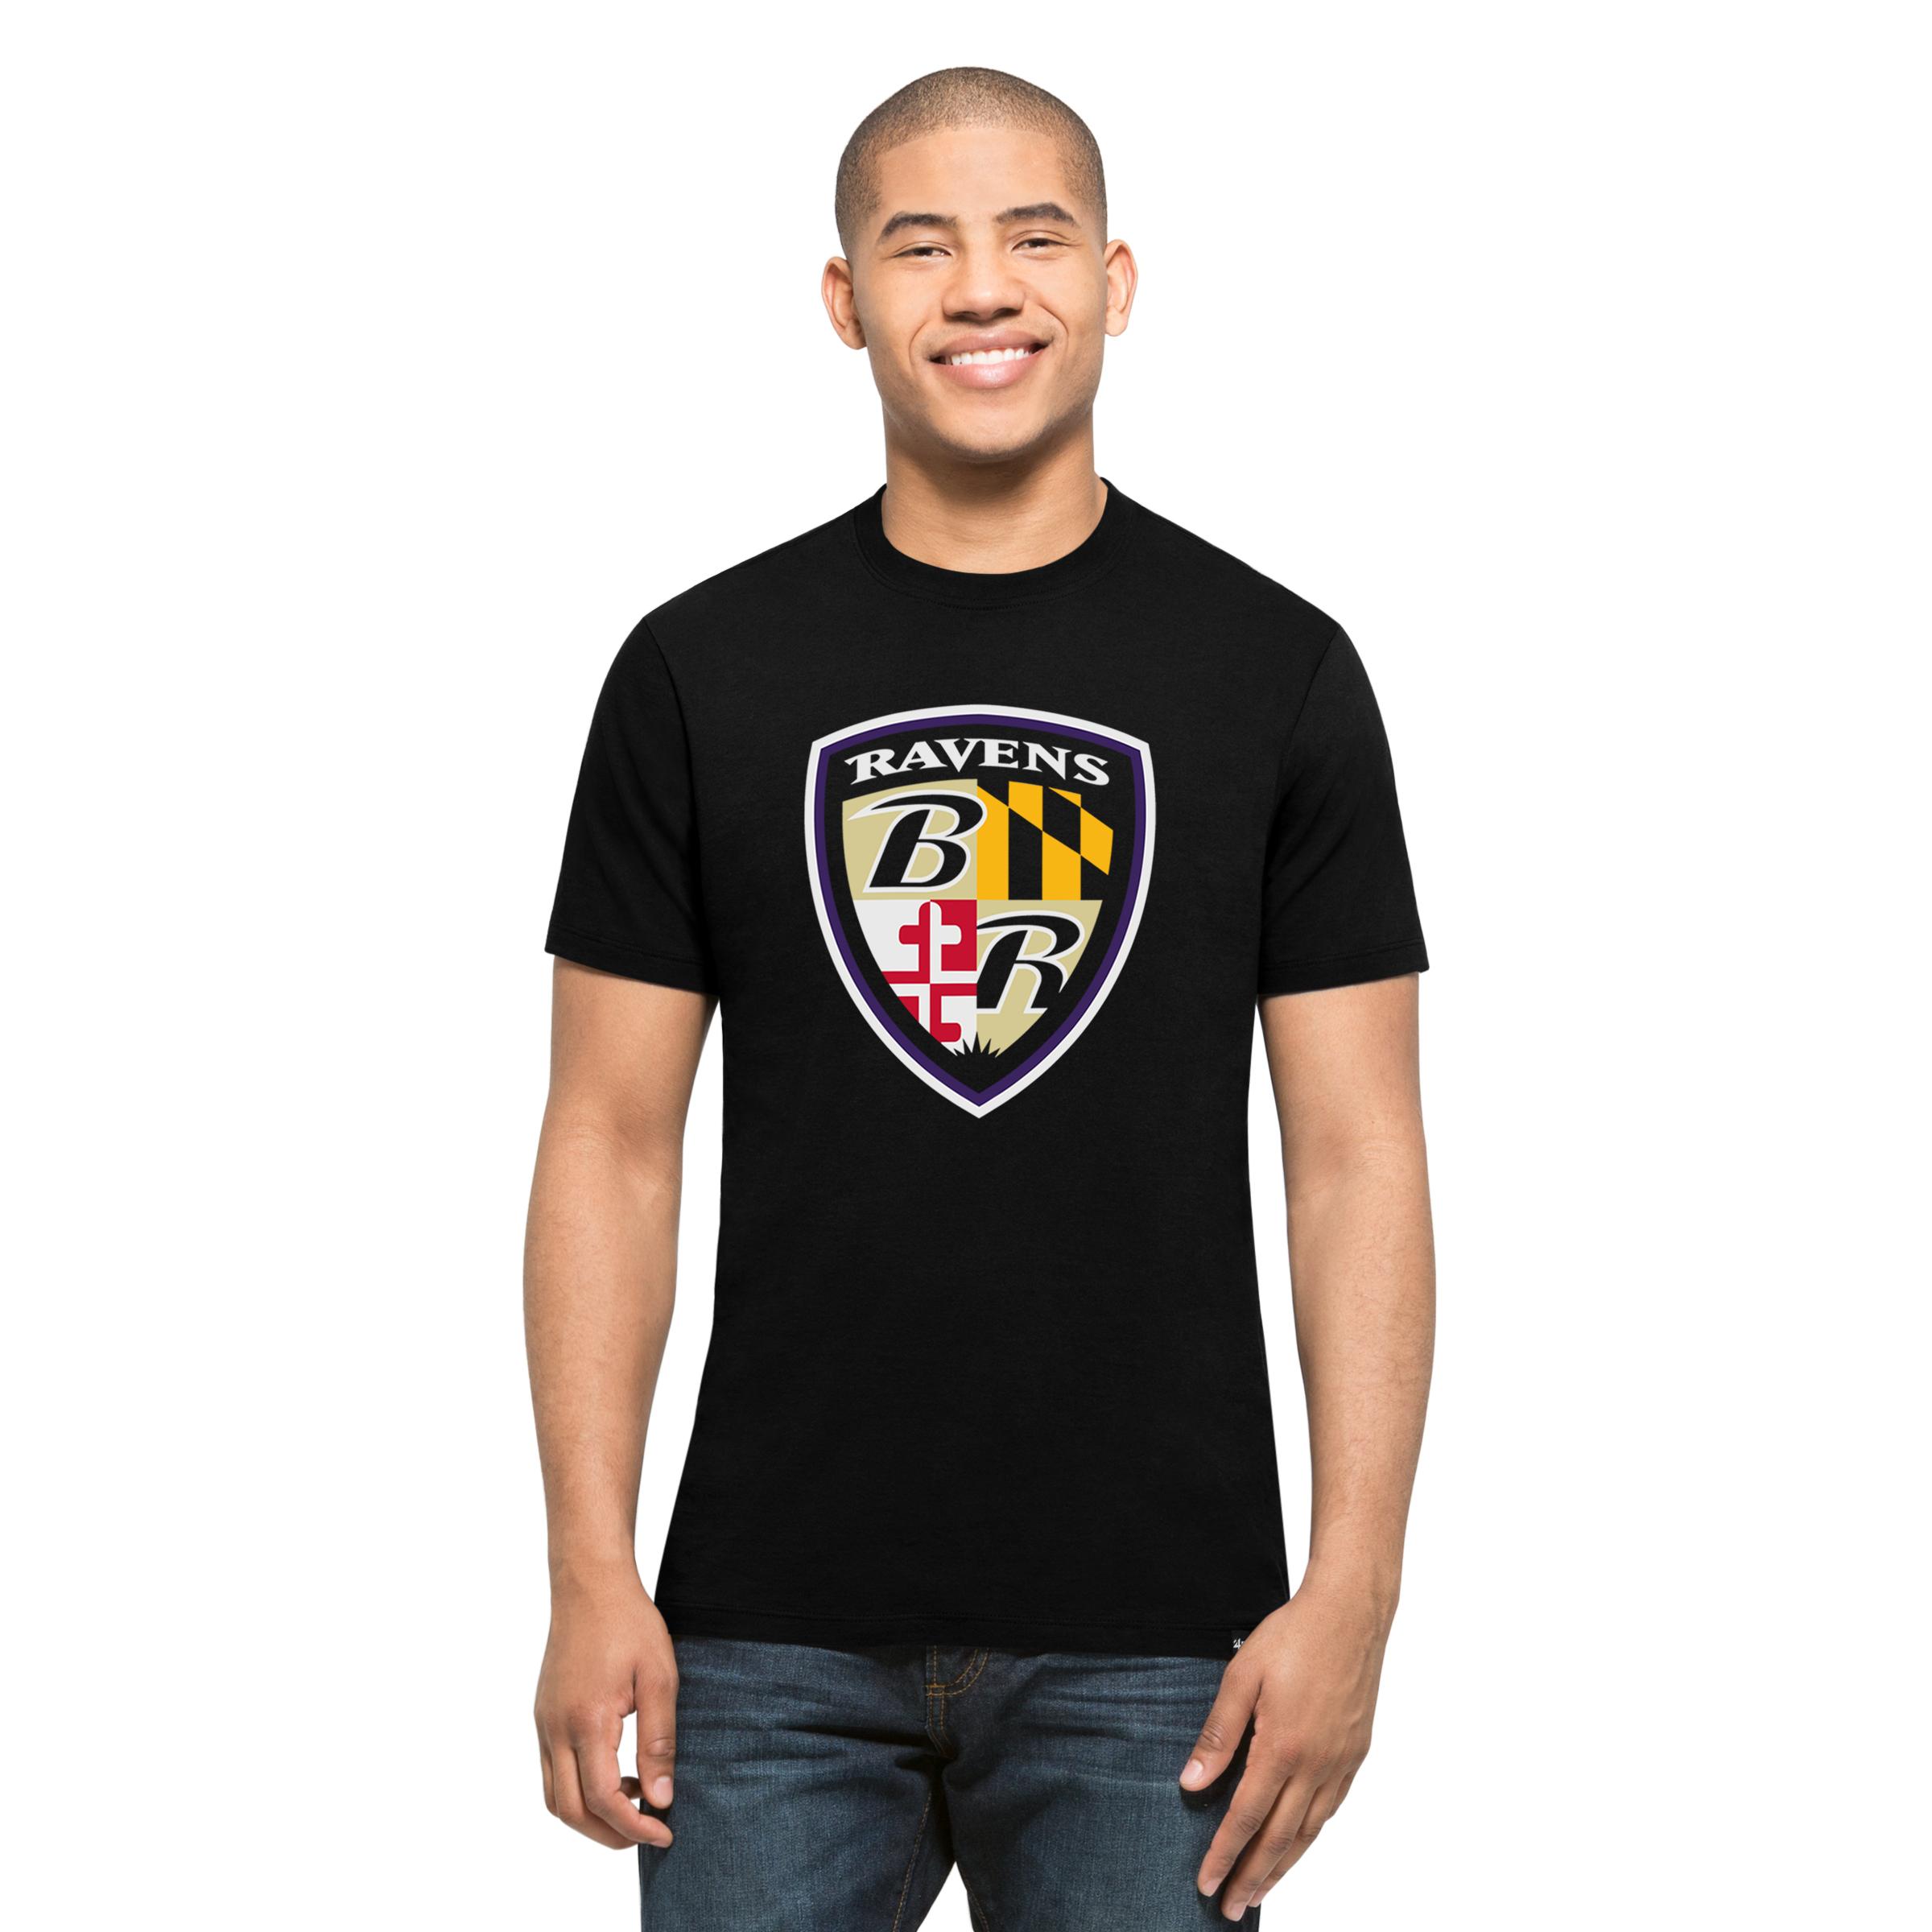 Baltimore Ravens Black Sheild S/S T-Shirt